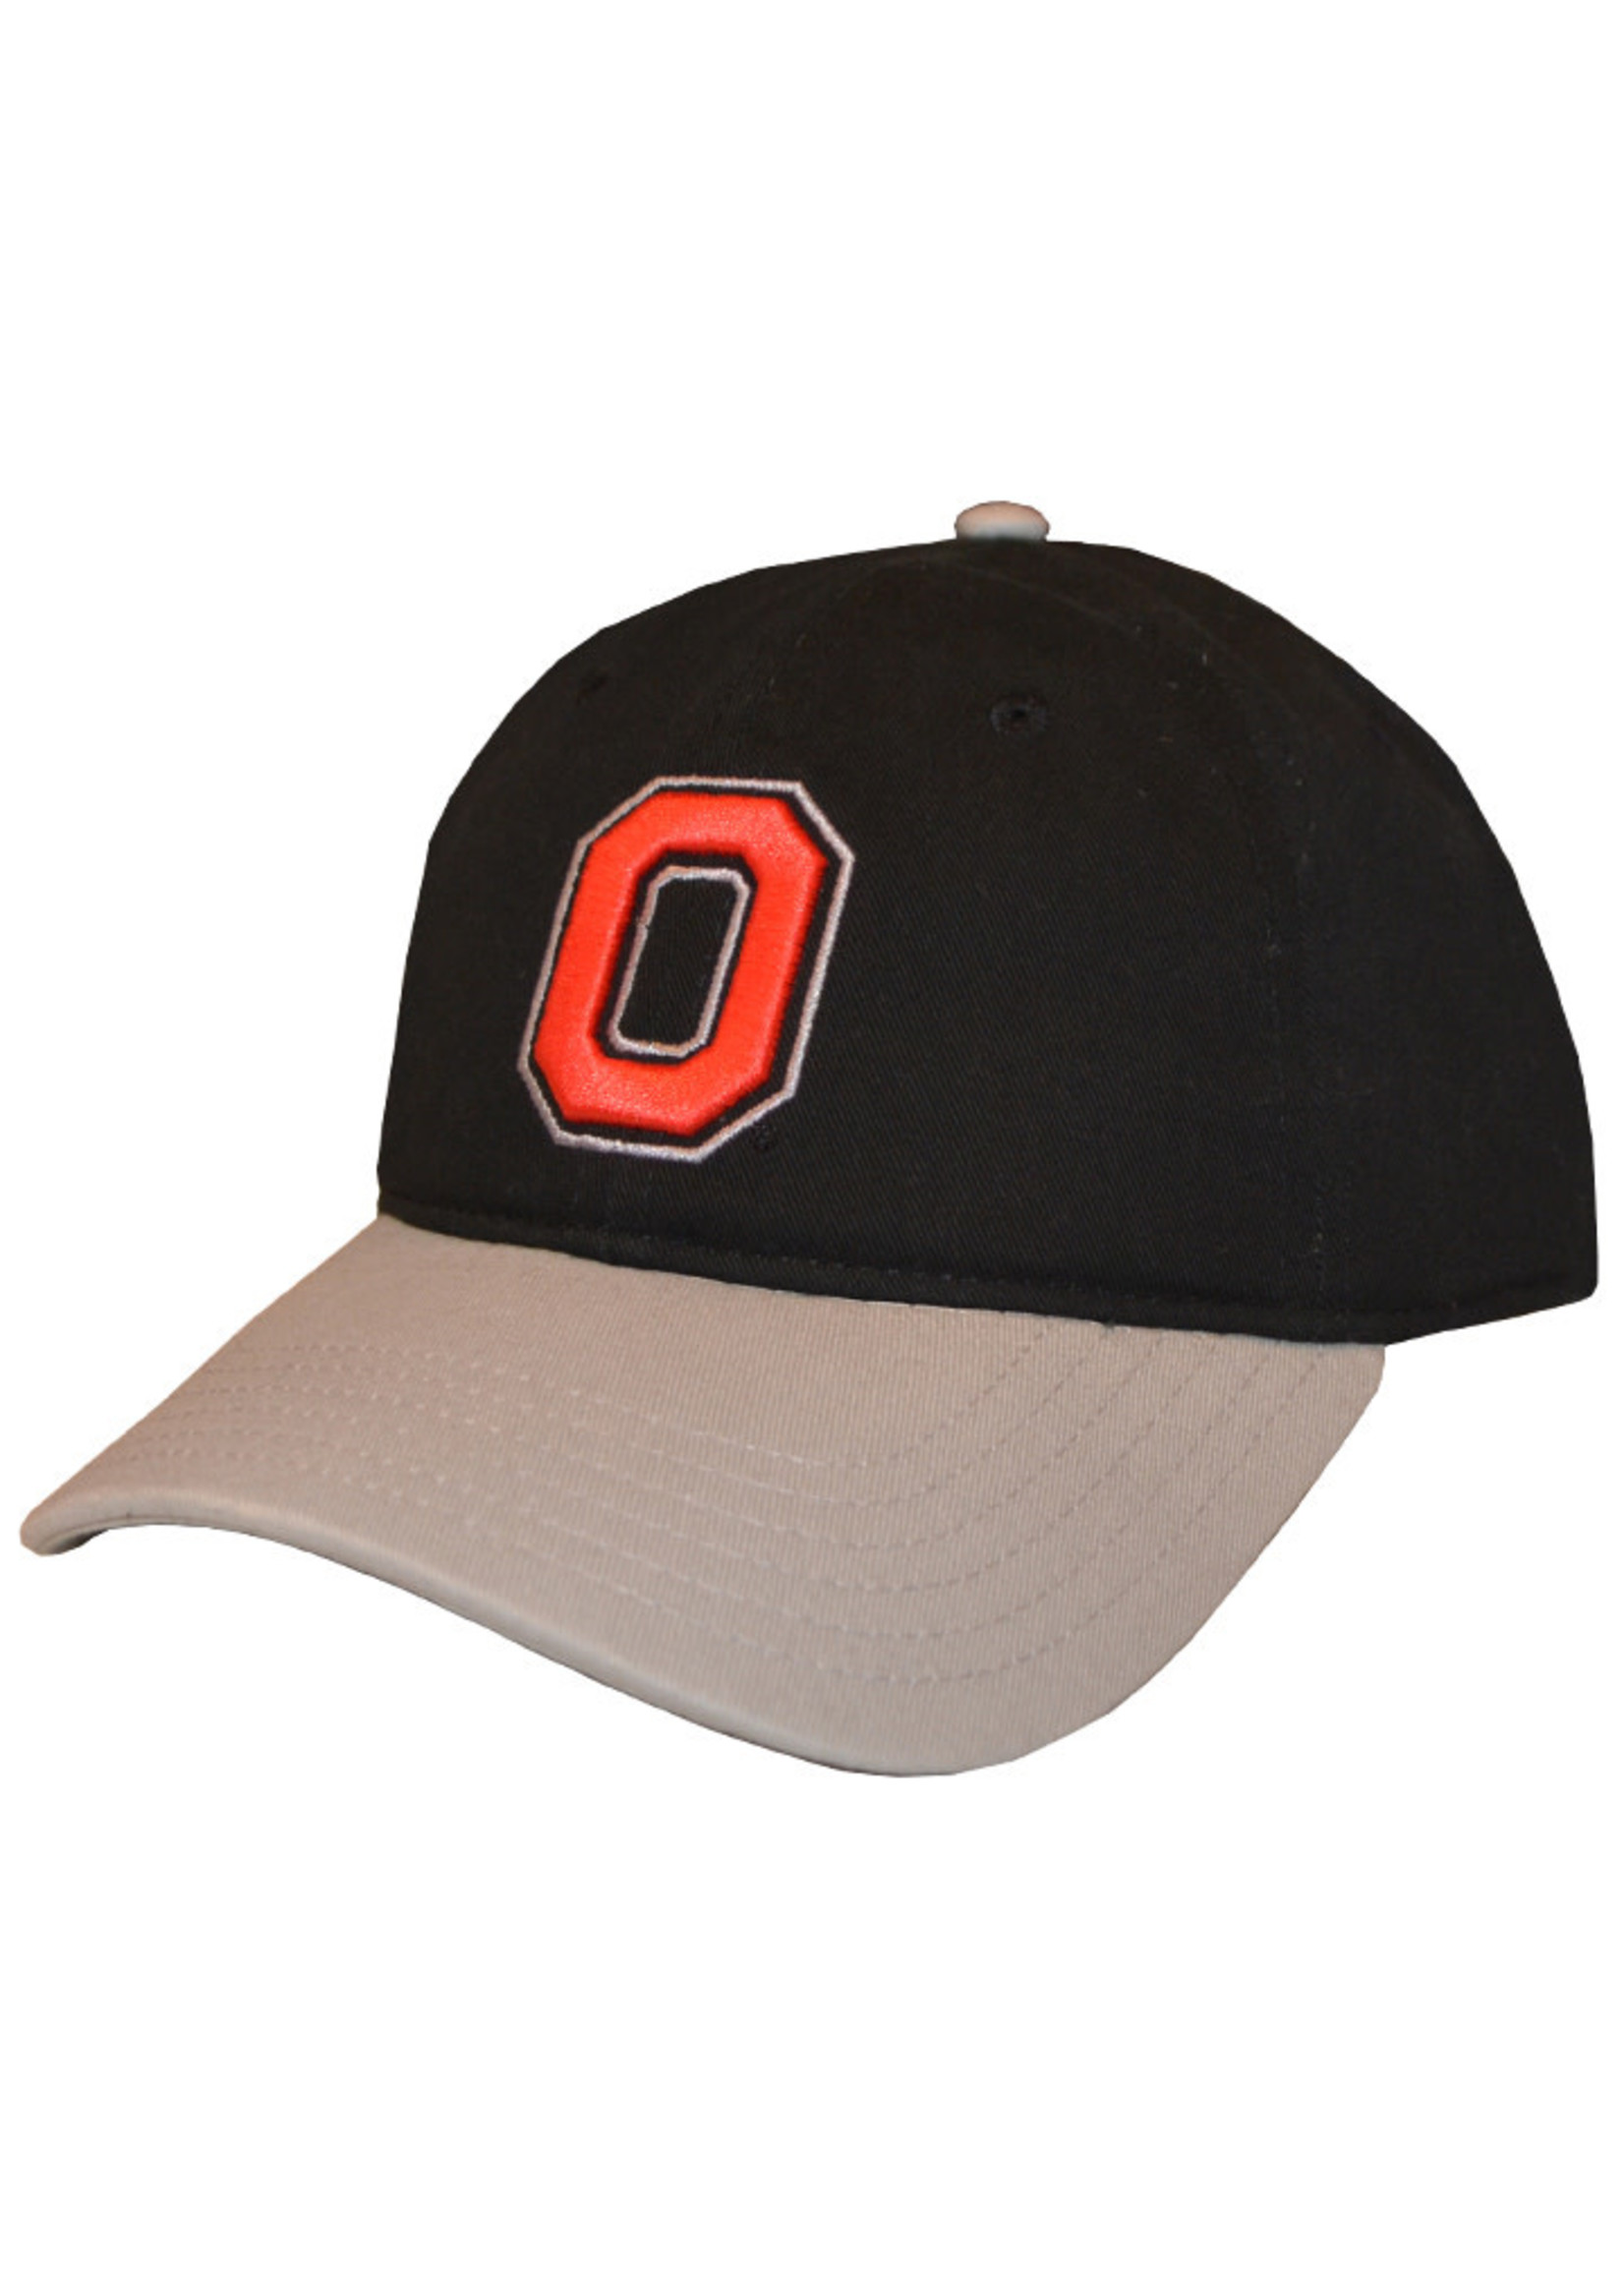 Top of the World Ohio State Buckeyes Black/Gray Adjustable Hat